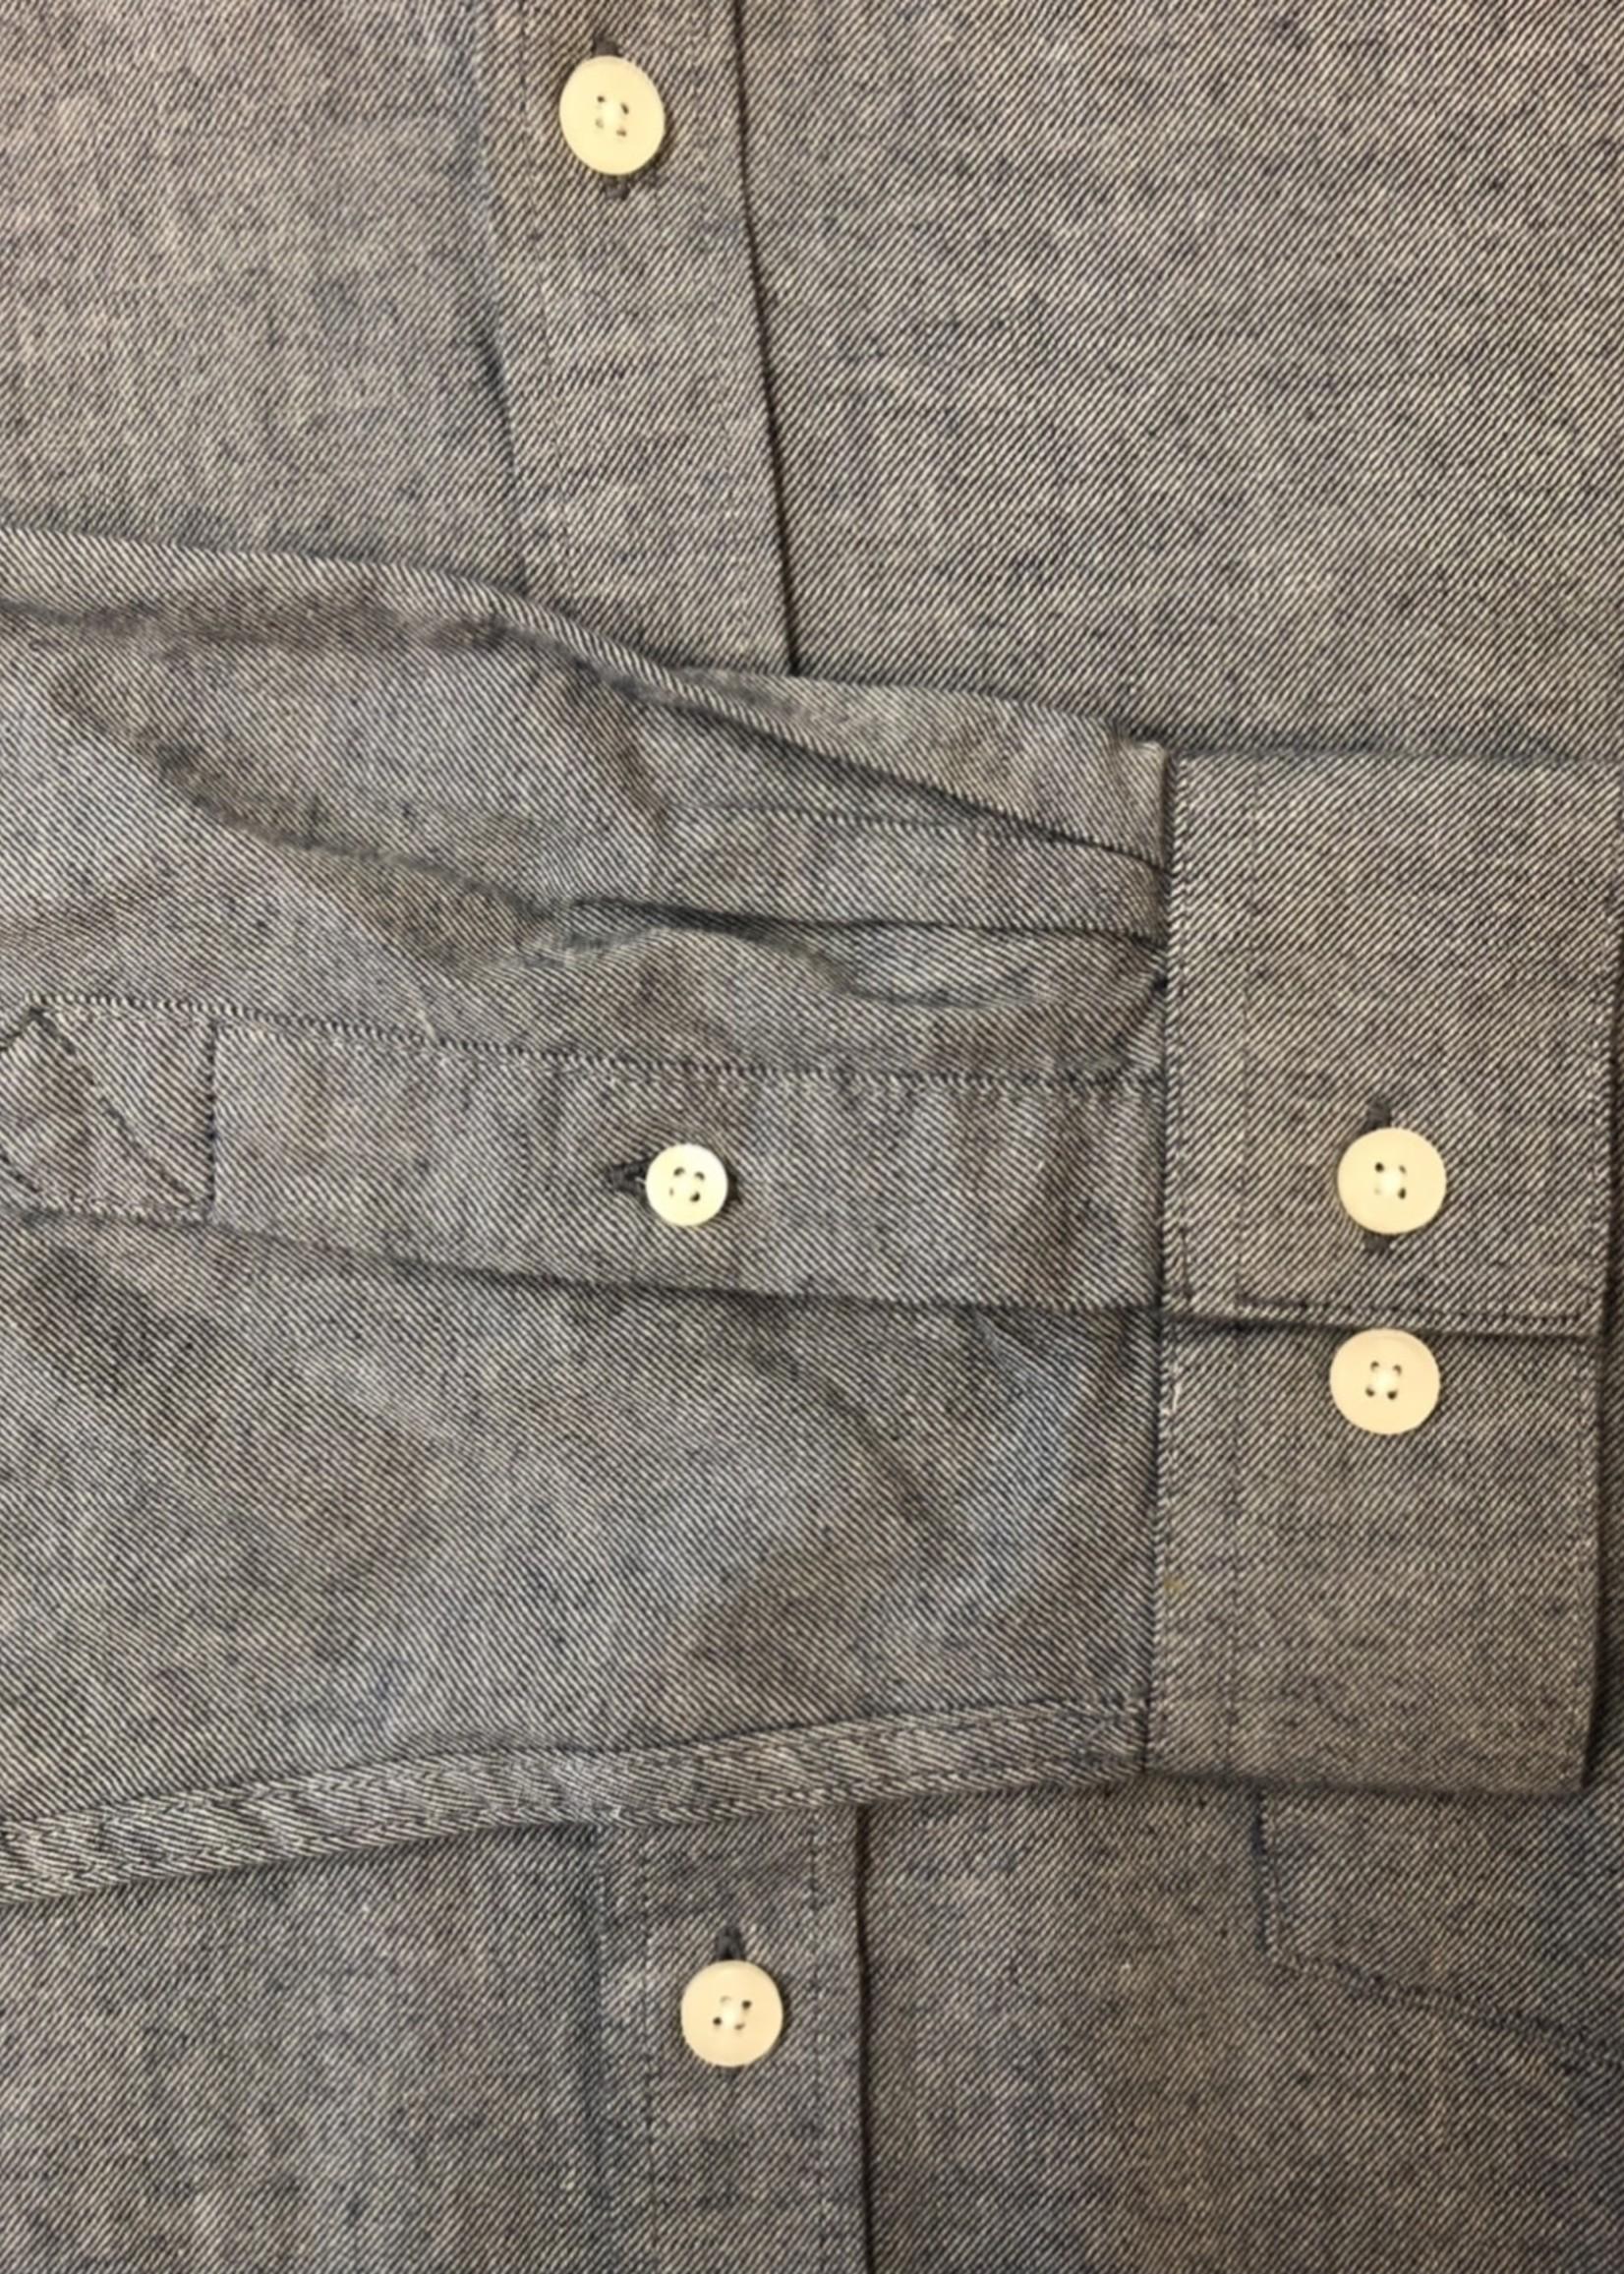 MINIMUM Jay 2.0 Long Sleeved Shirt